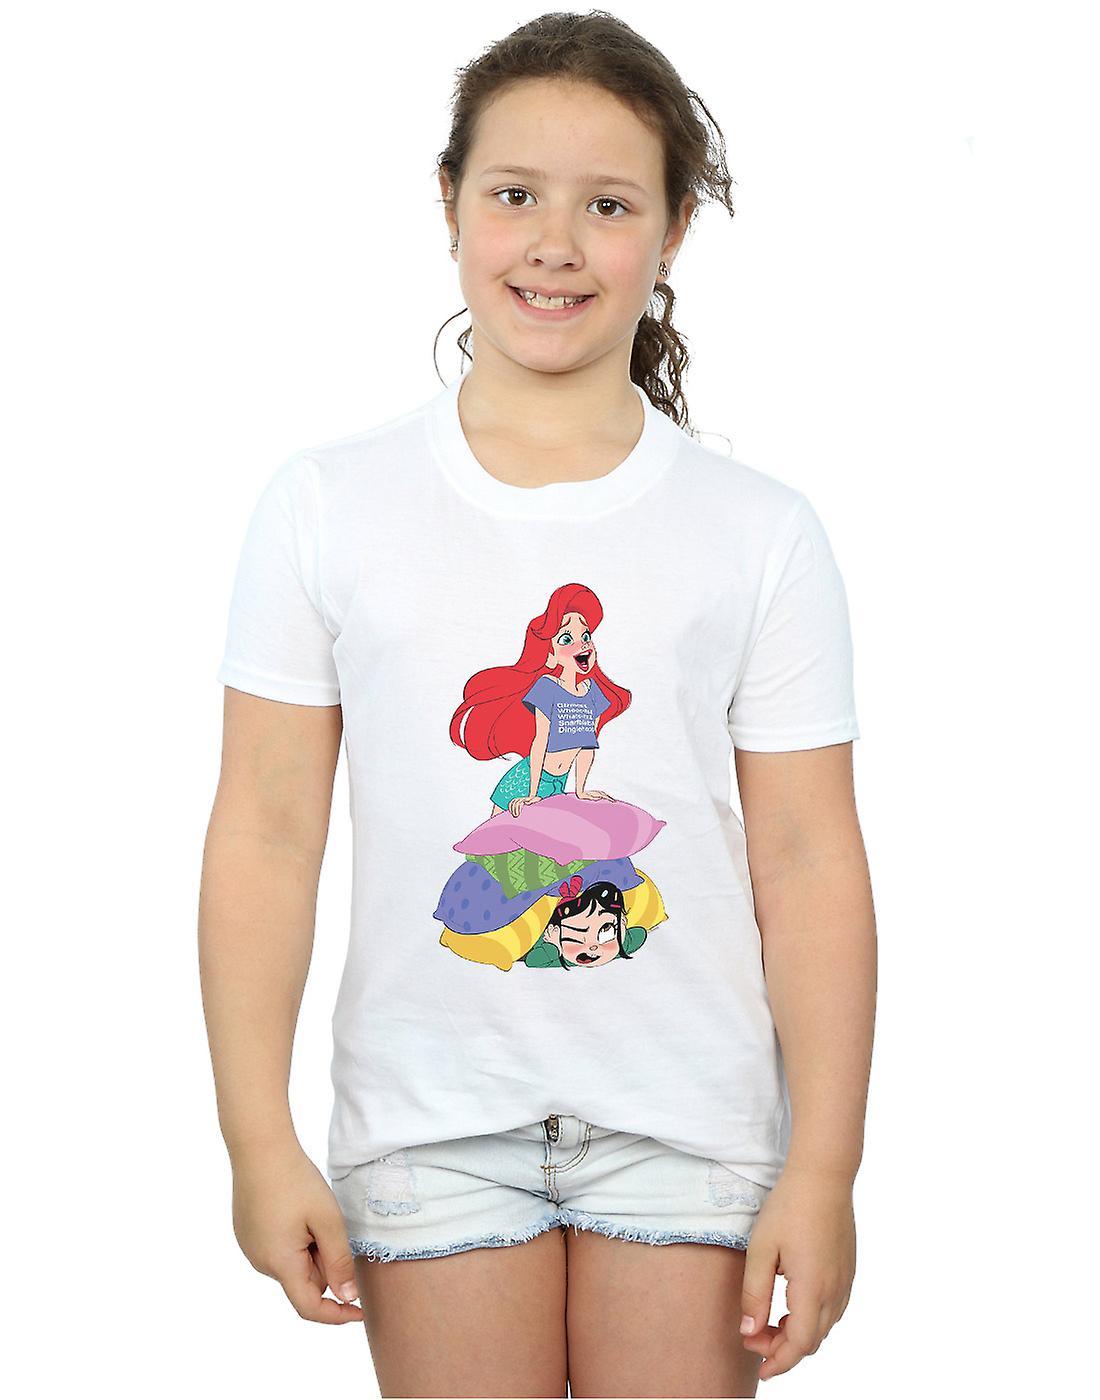 Disney Girls Wreck It Ralph Ariel And Vanellope T-Shirt